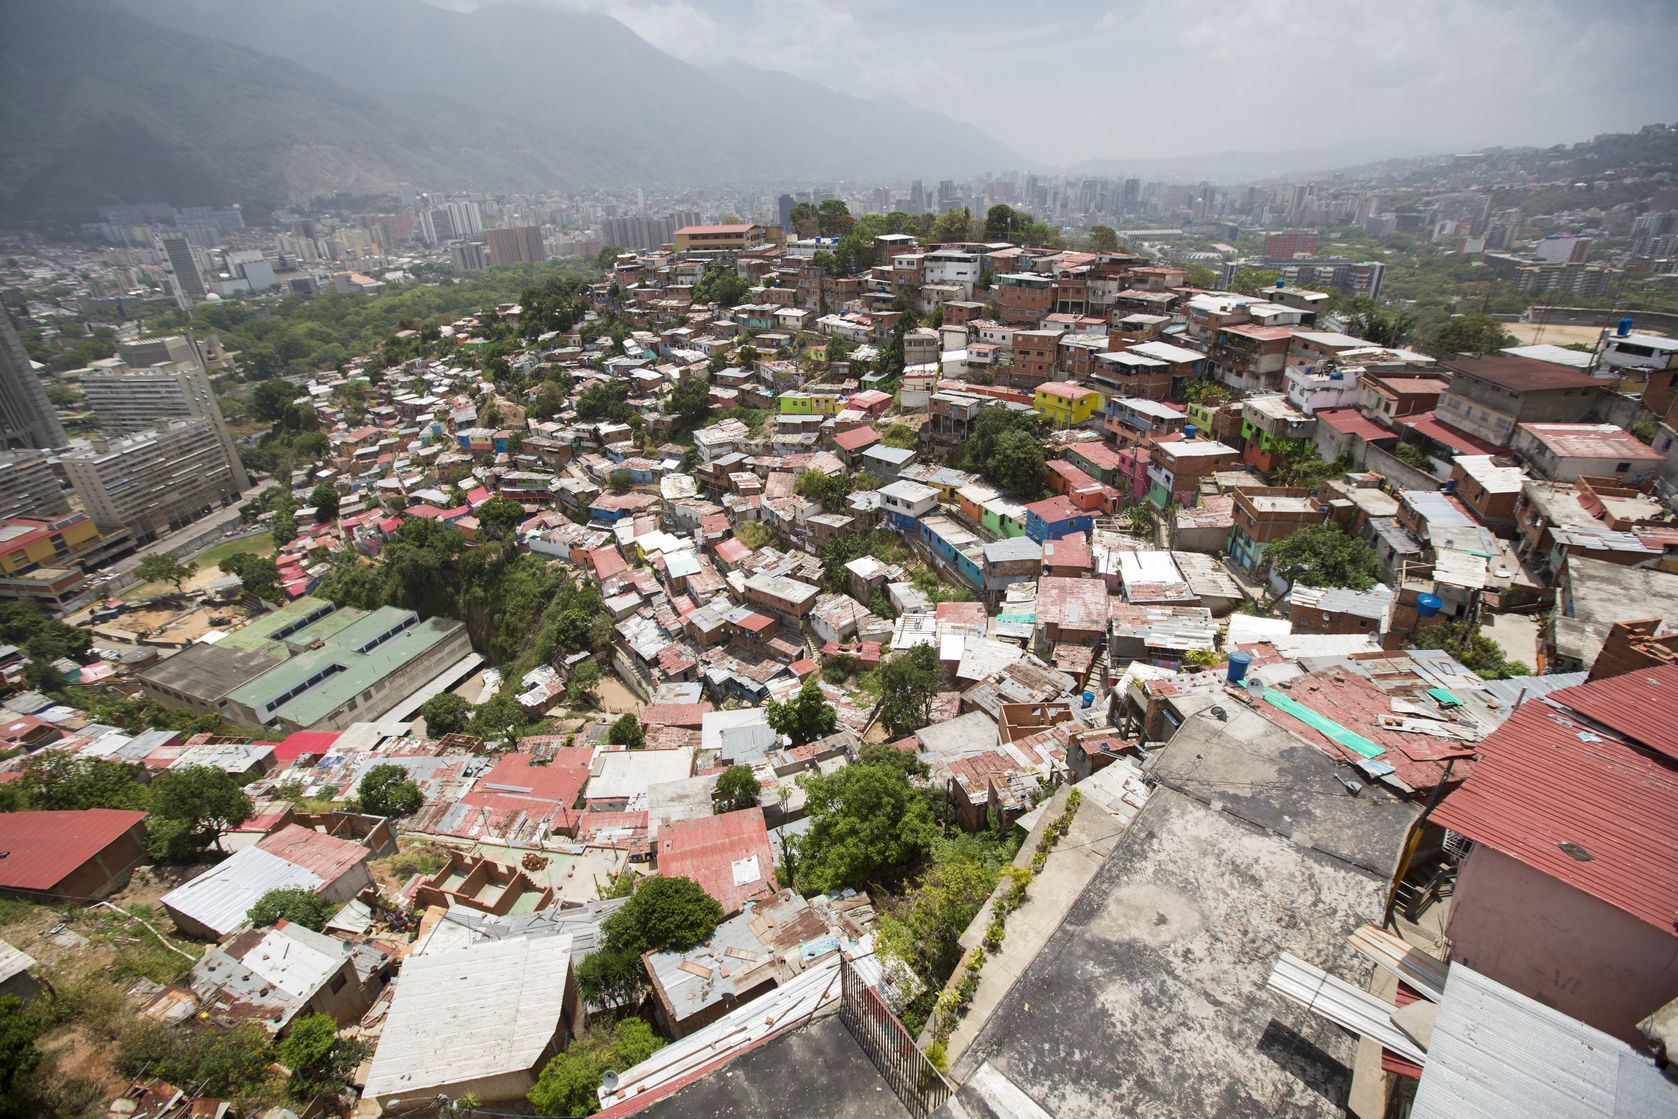 Domky v Caracasu ve Venezuele | piccaya/123RF.com